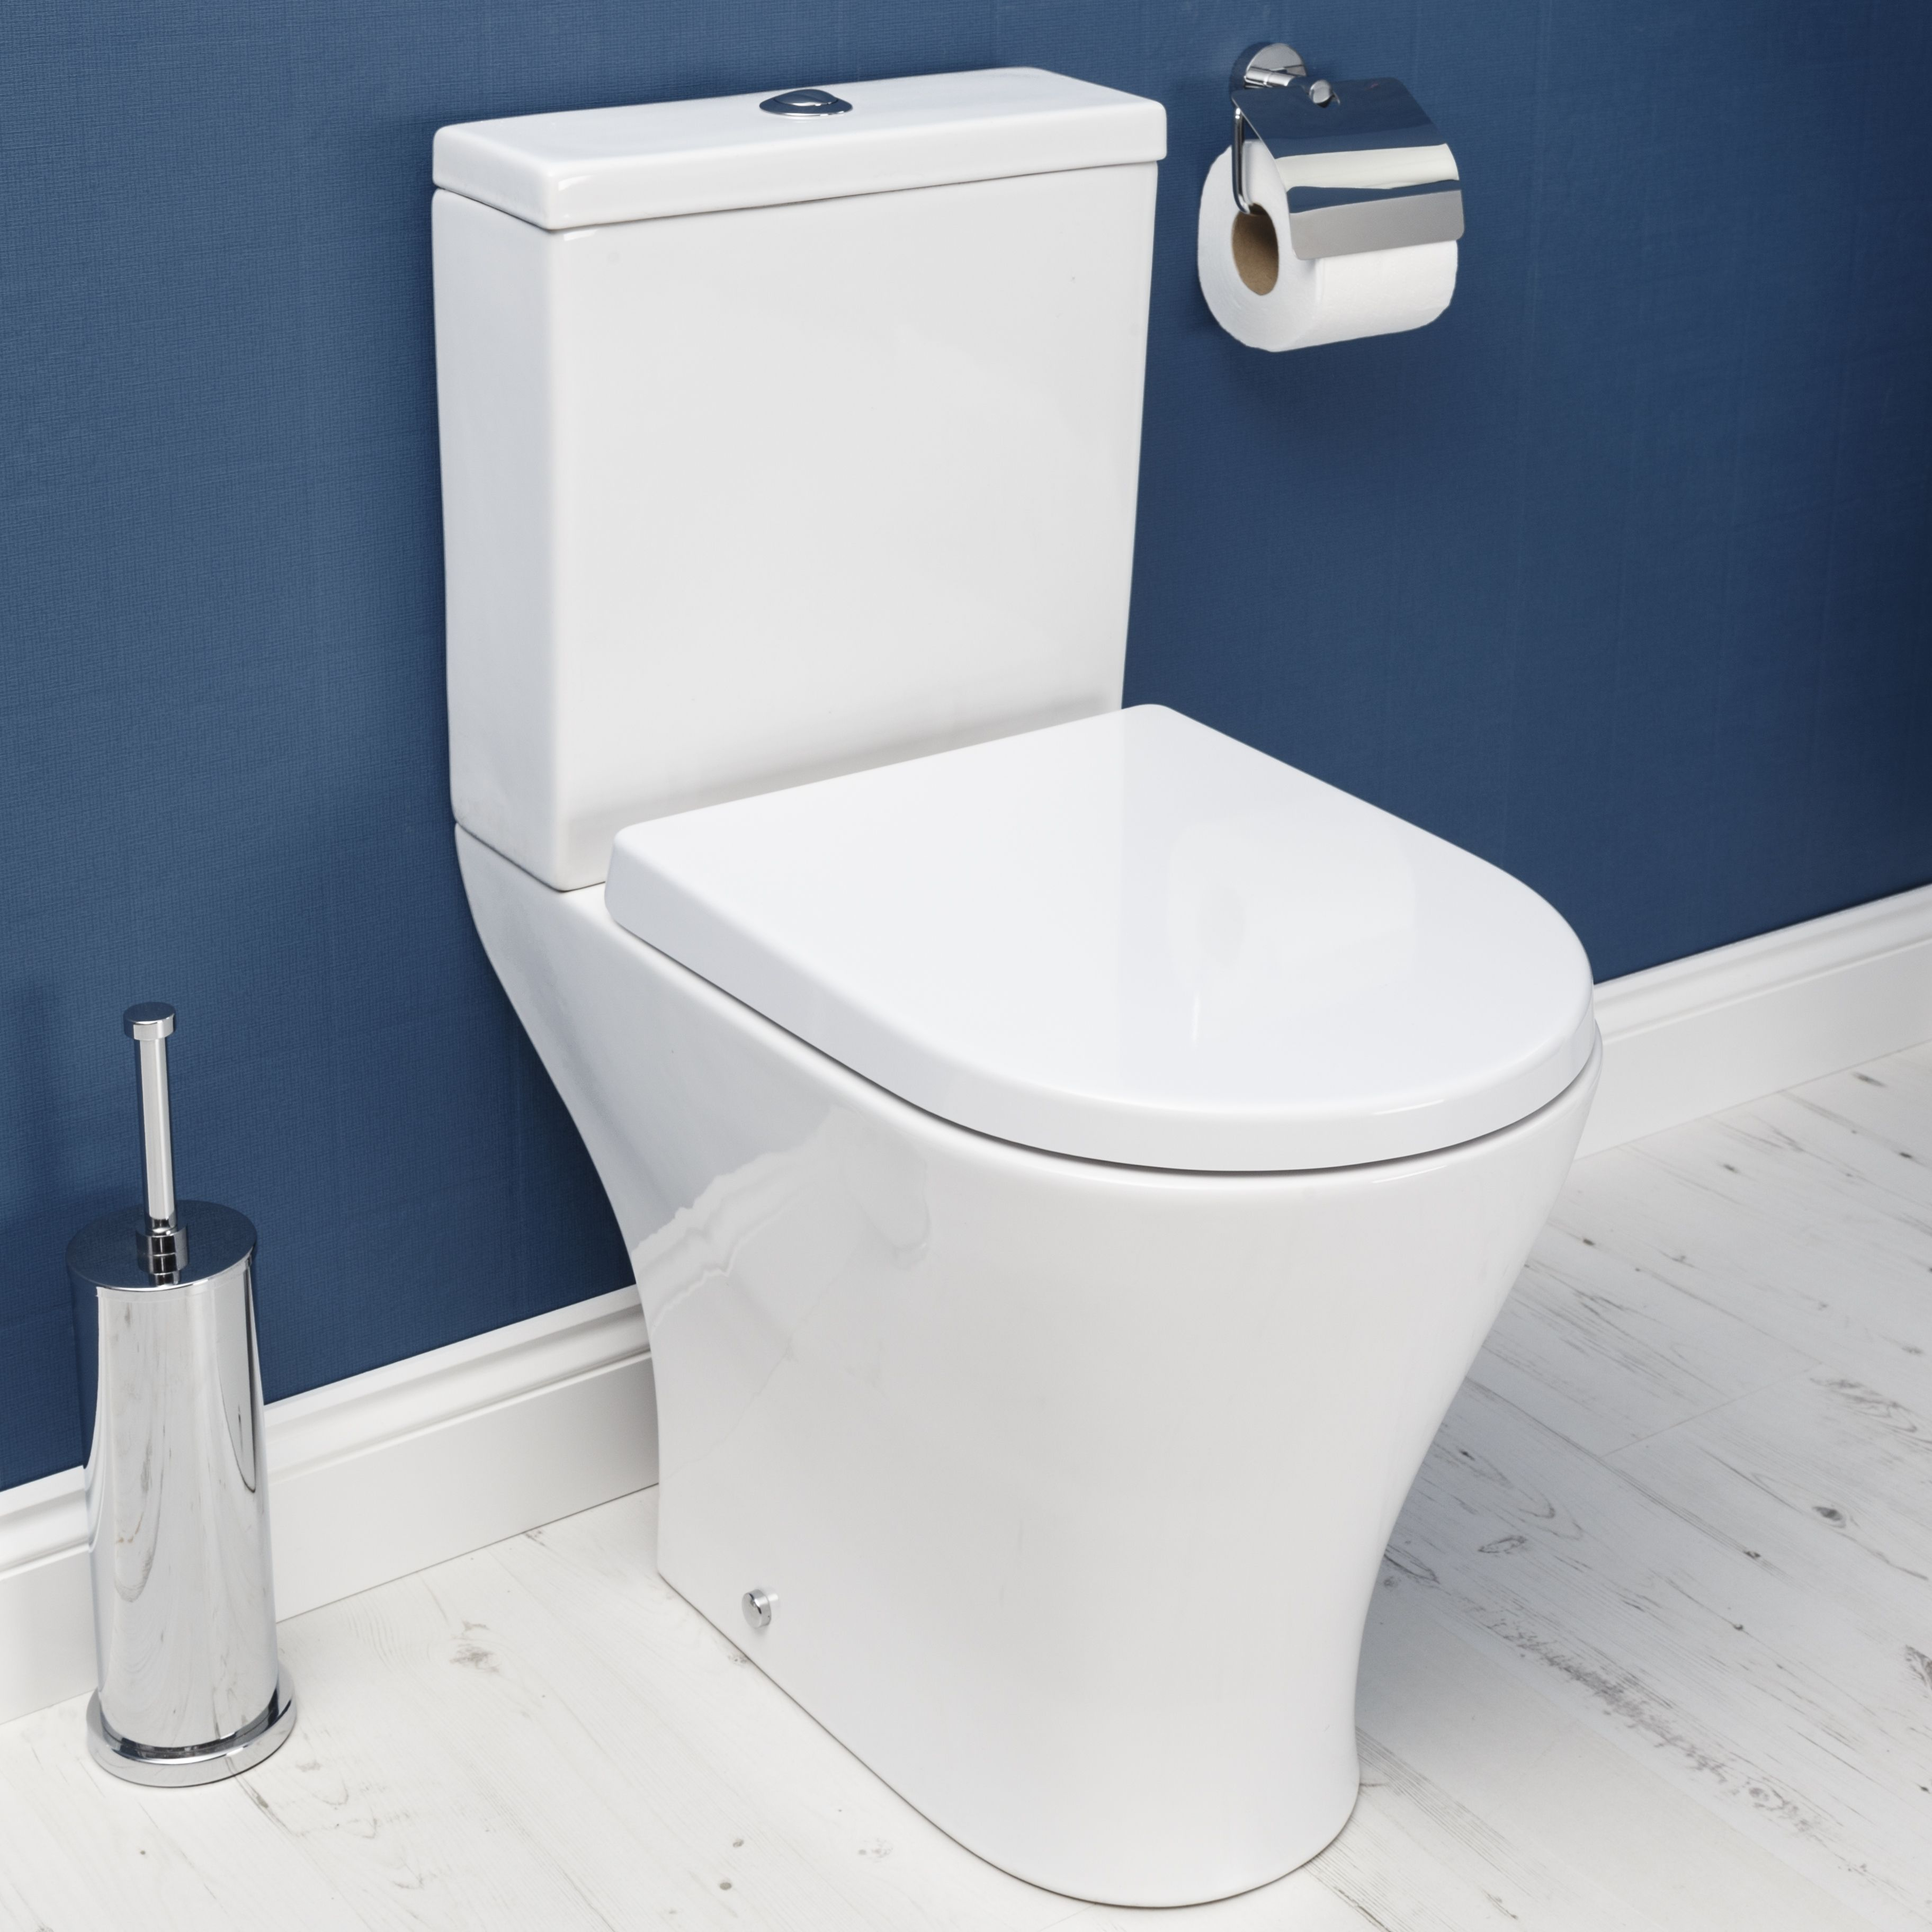 Ceramica Arles Space Saving Toilet & Soft Close Seat